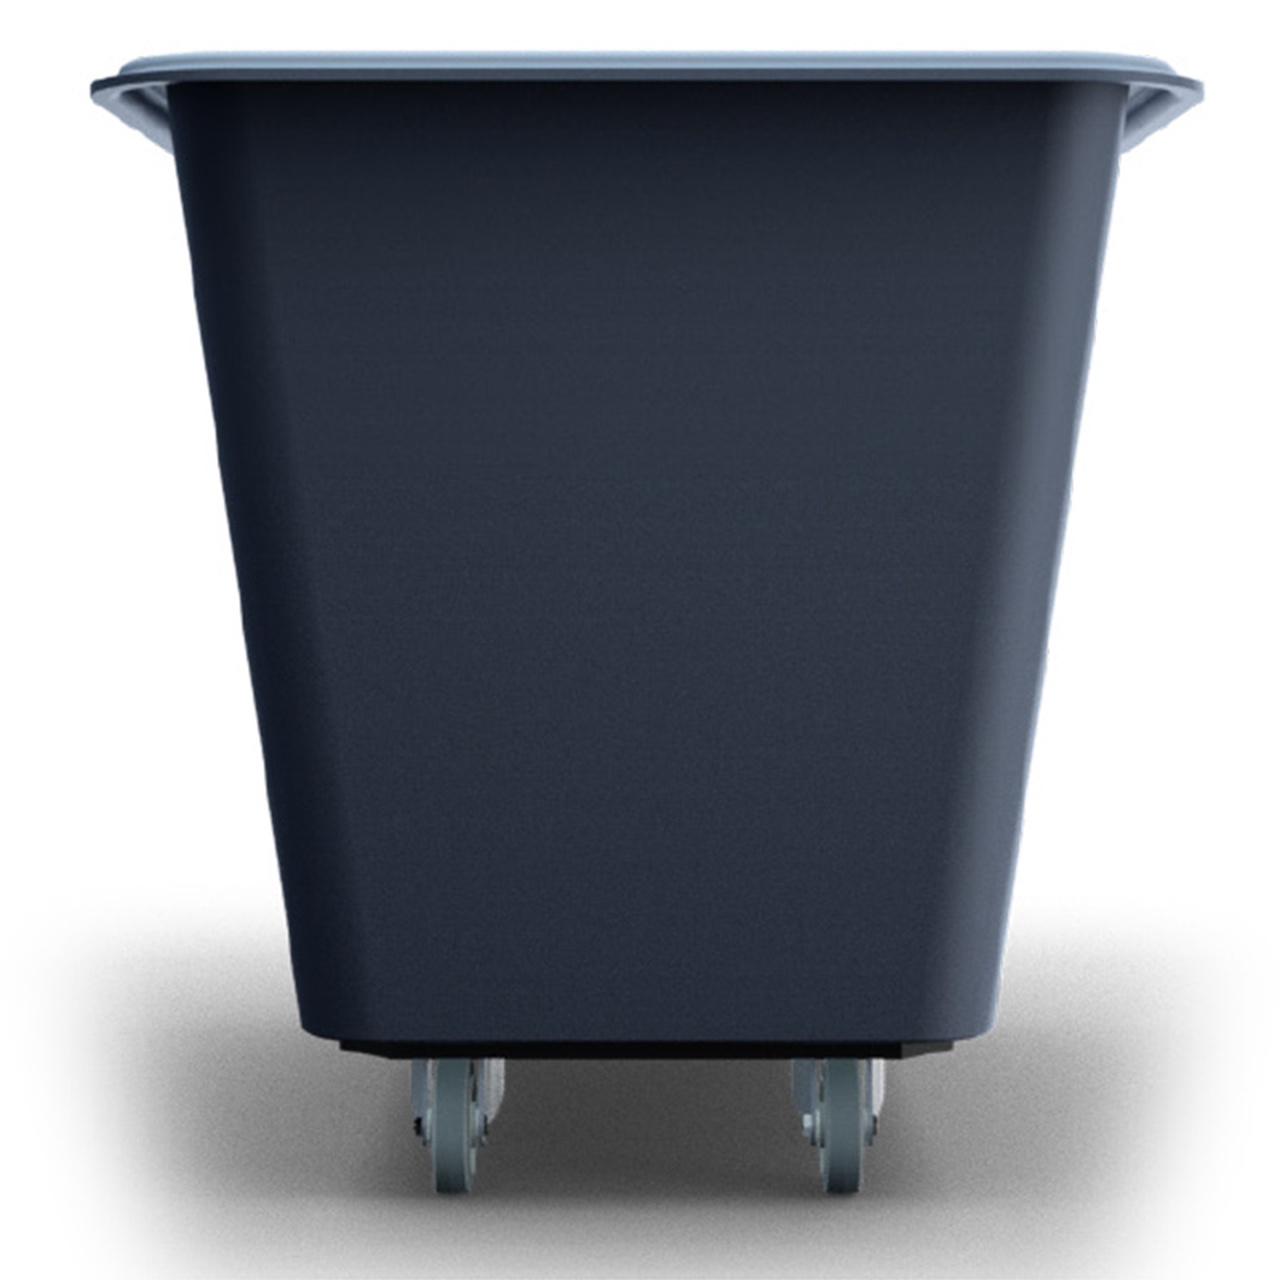 Utility-Trux Bin Cart Front View